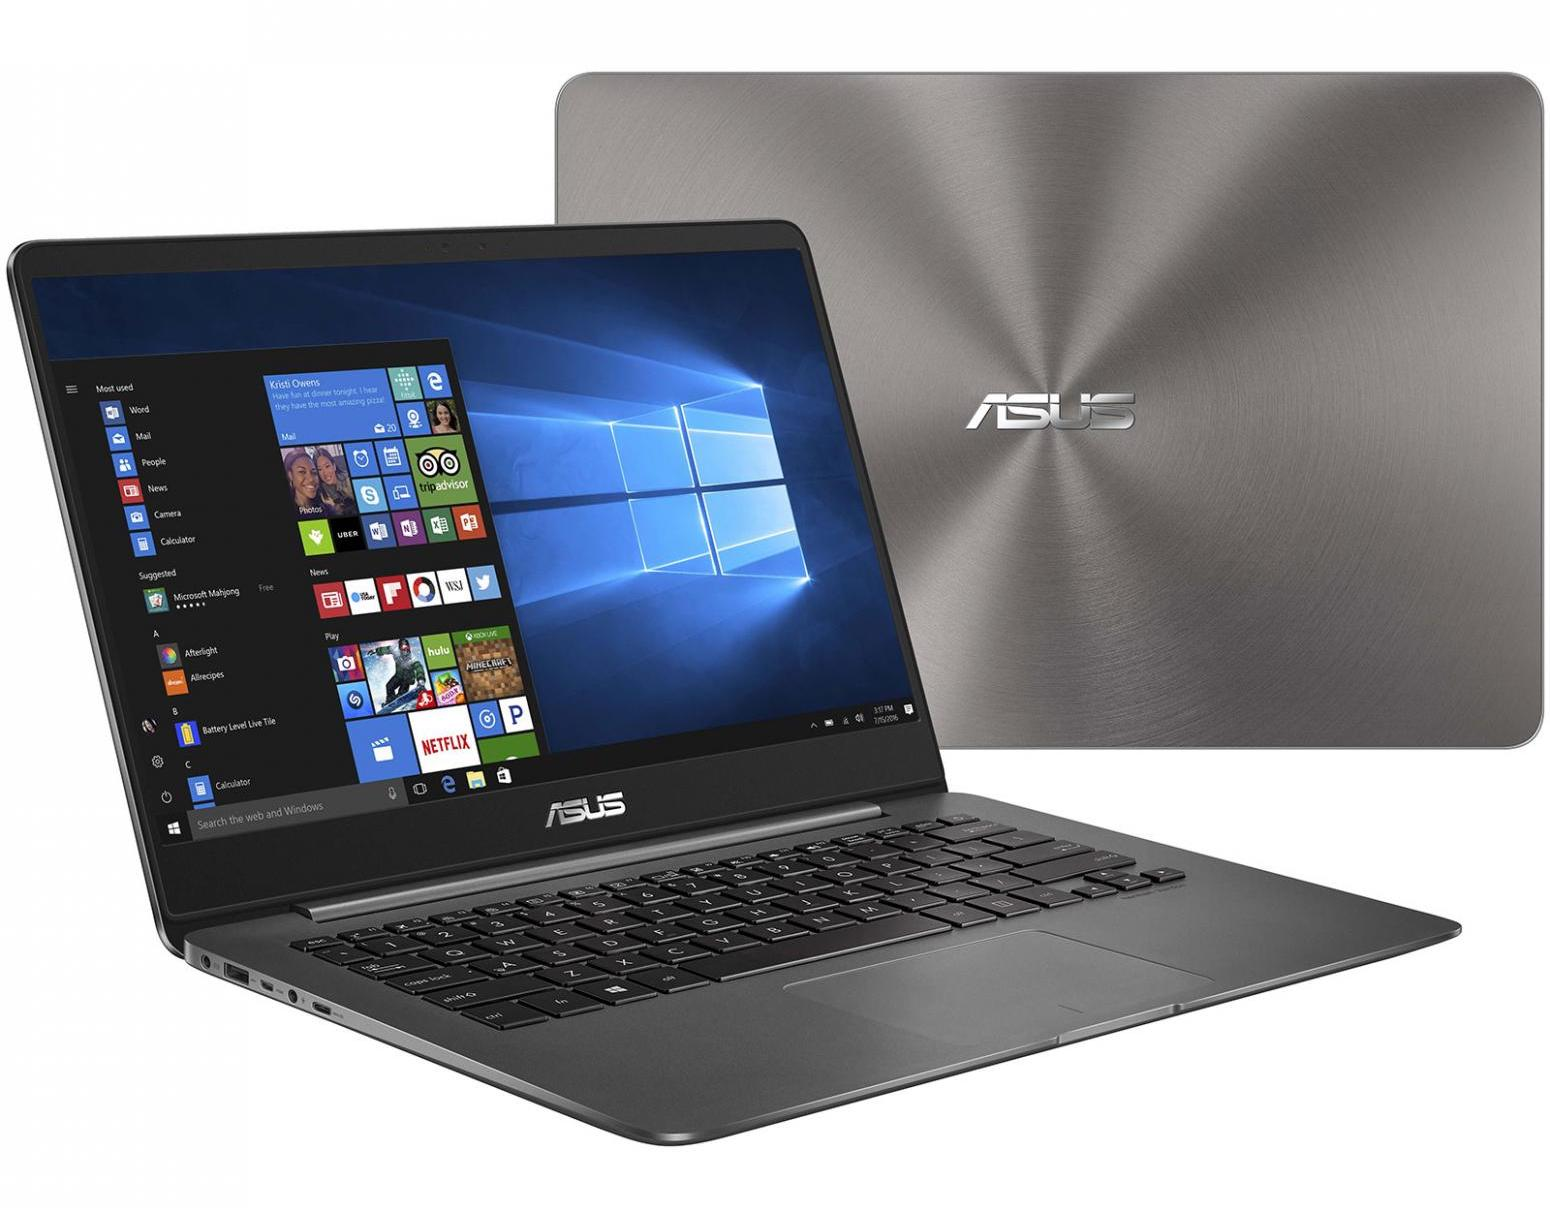 Asus Zenbook UX430UA-GV046R, ultrabook 14 pouces fin Pro i5 Kaby SSD à 899€